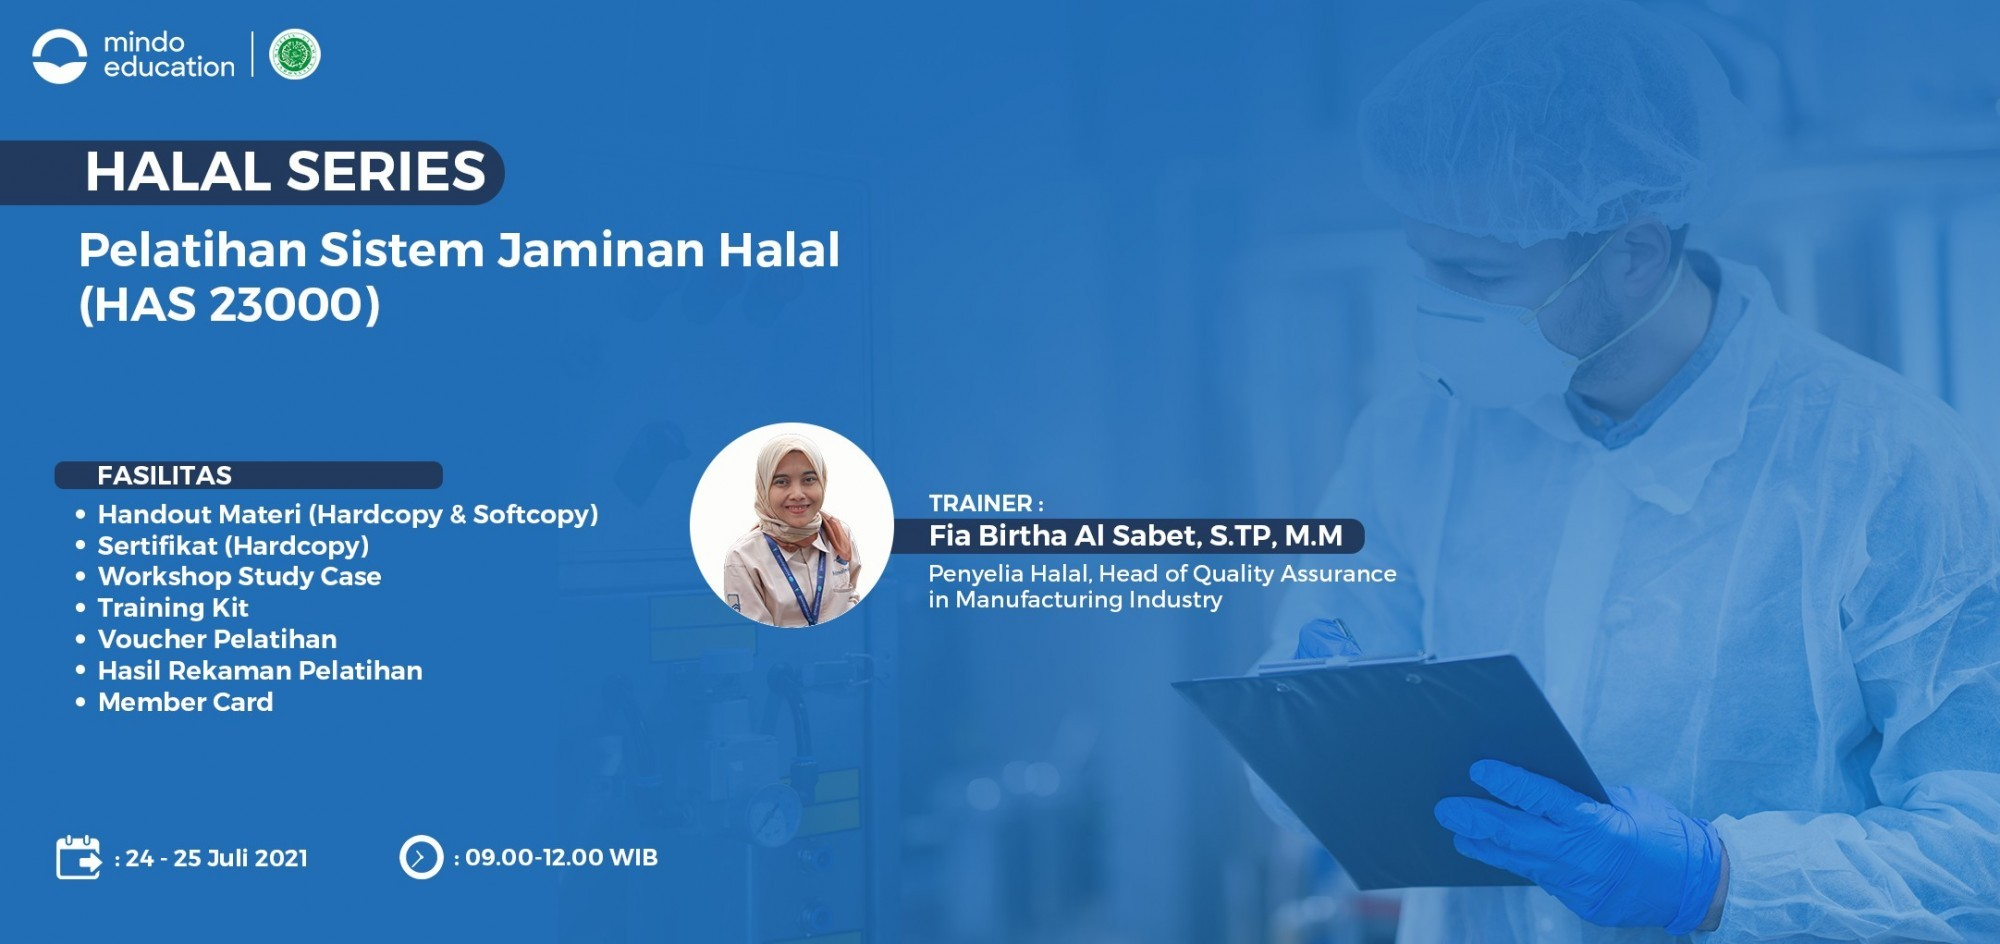 ONLINE TRAINING - Pelatihan Sistem Jaminan Halal (HAS 23000)